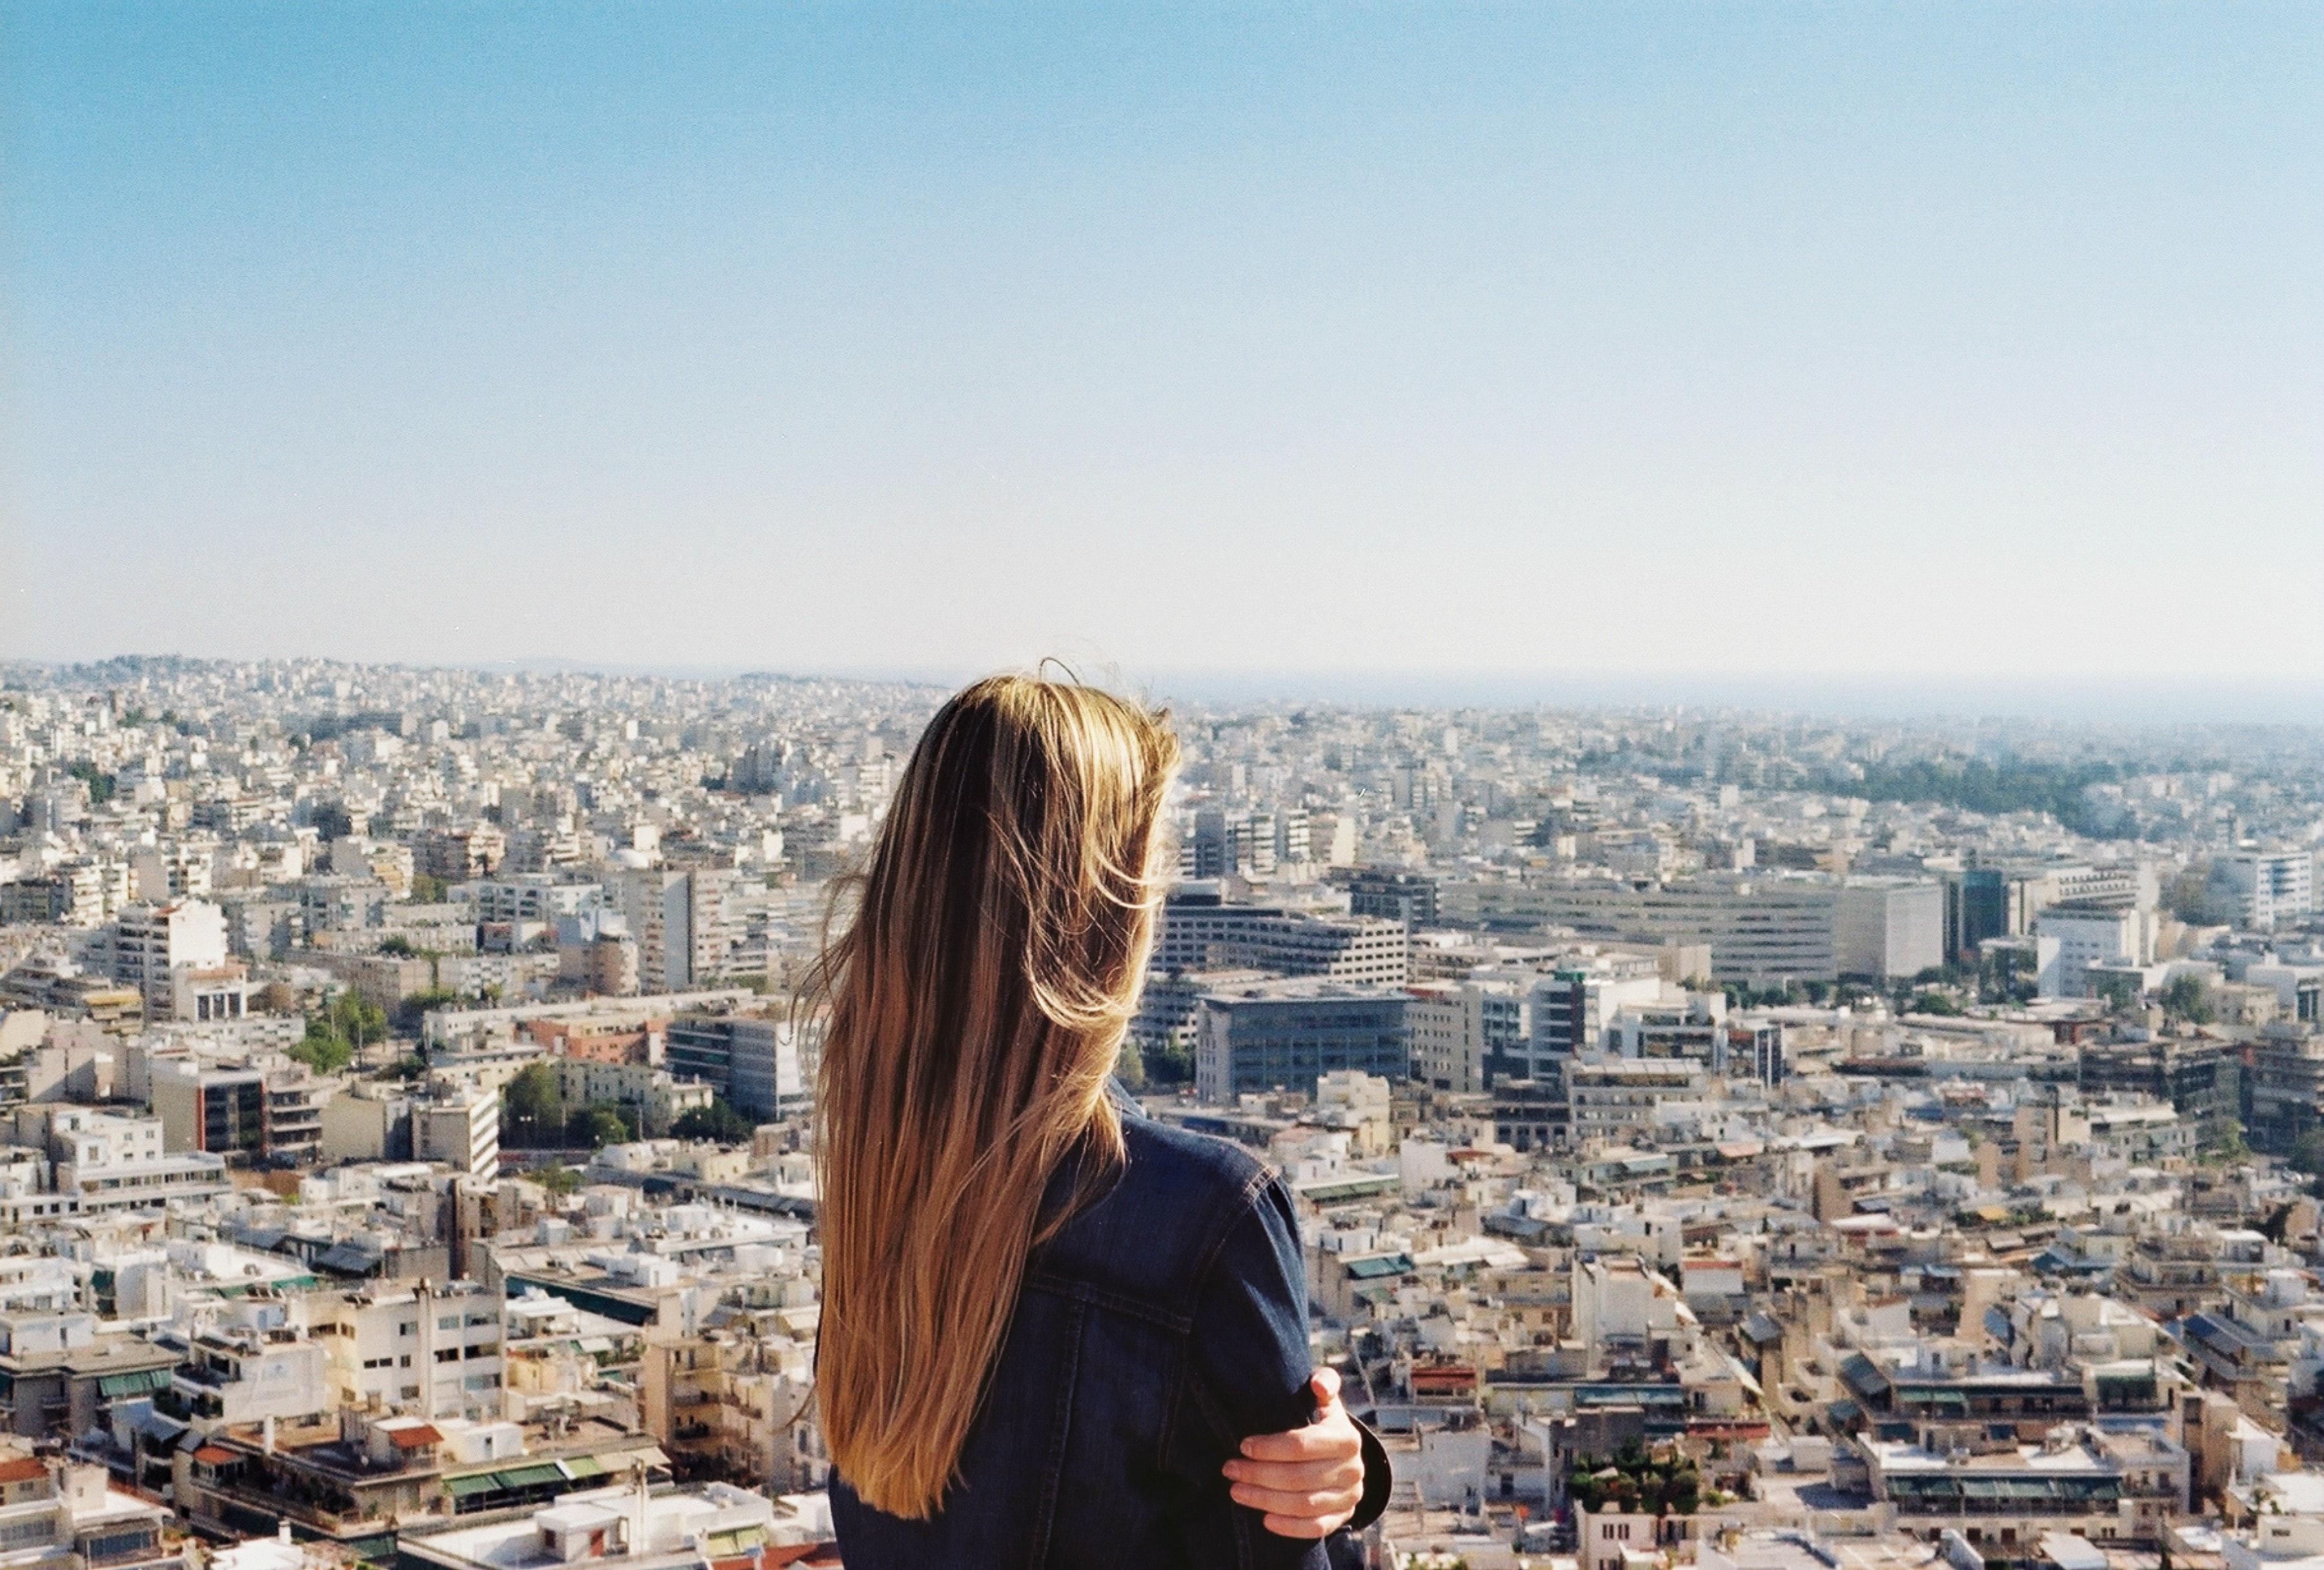 An open letter to women forging their own path Thumbnail